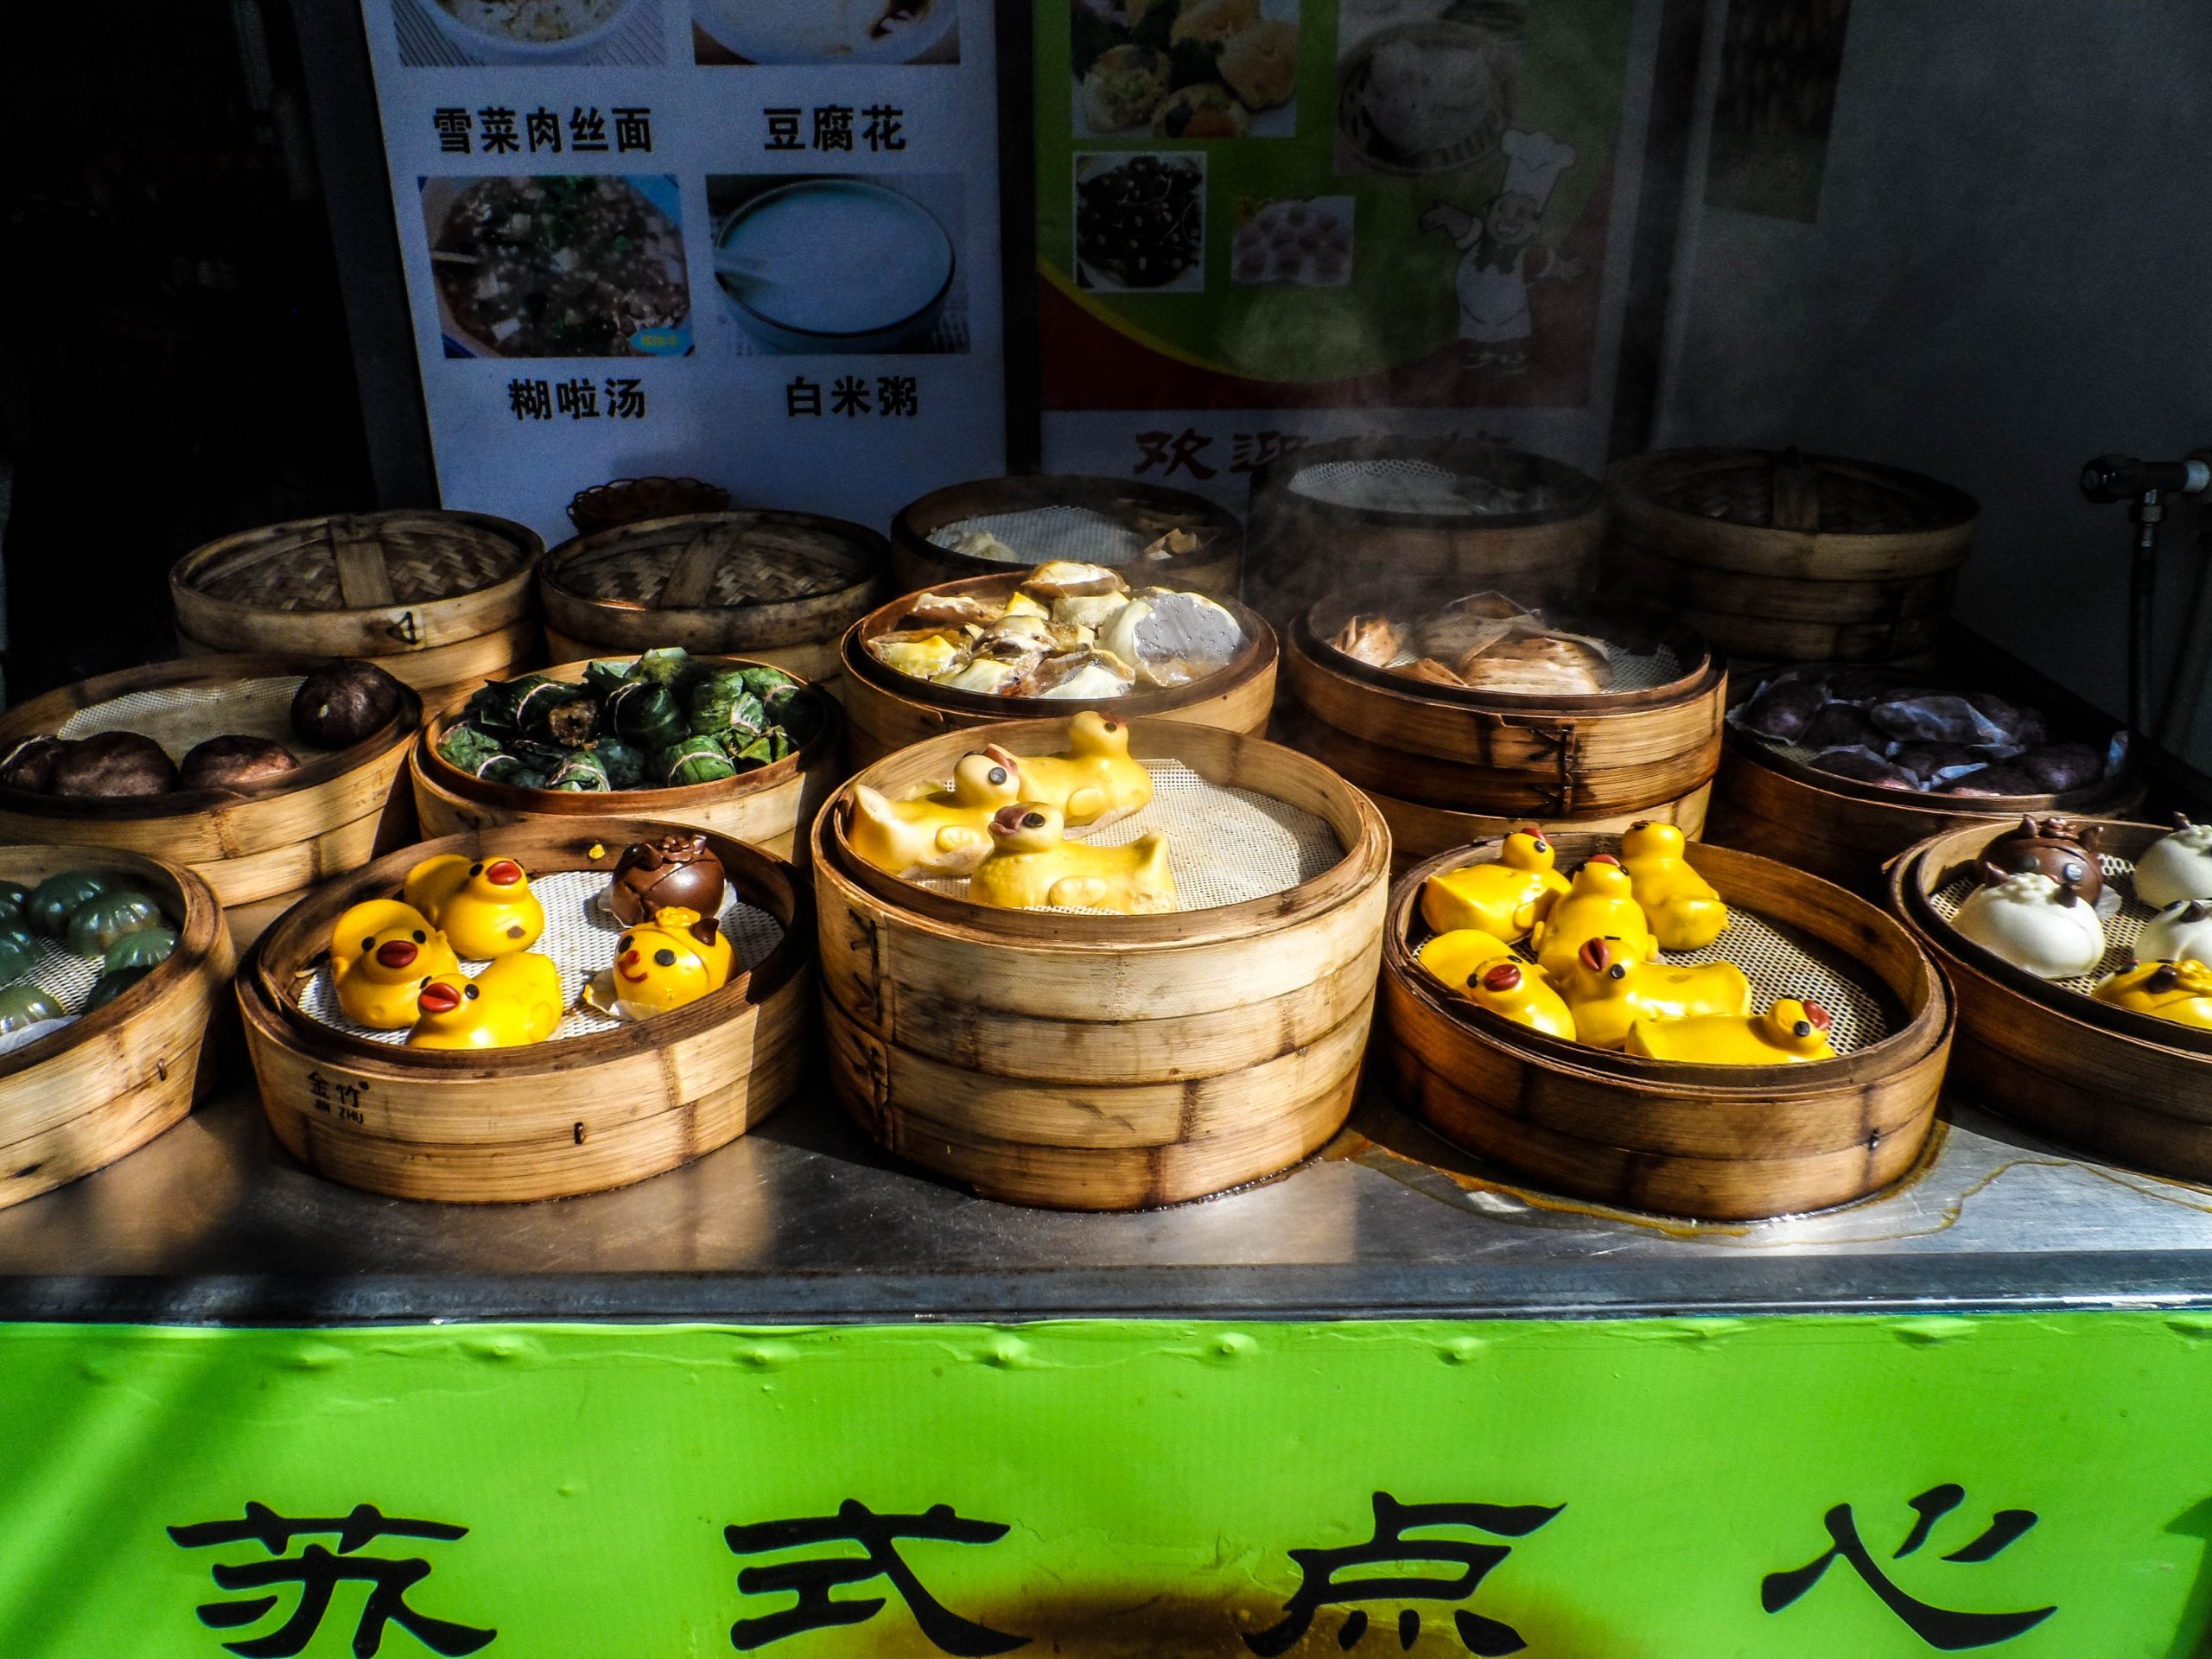 Yellow duck steamed buns